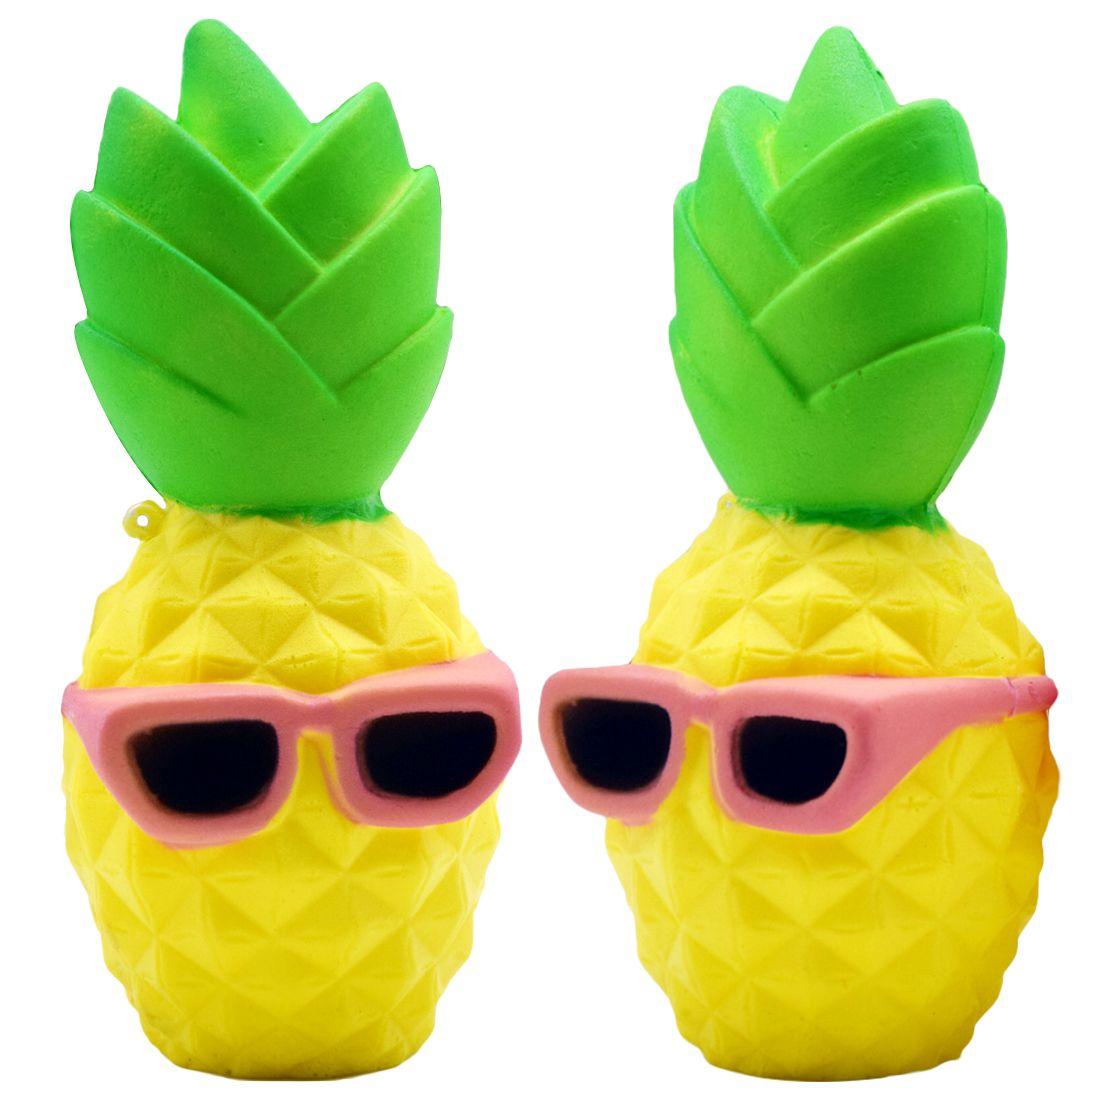 Acquista Hot 16 Cm Ananas Squishy Slow Rising Anti Stress Soft